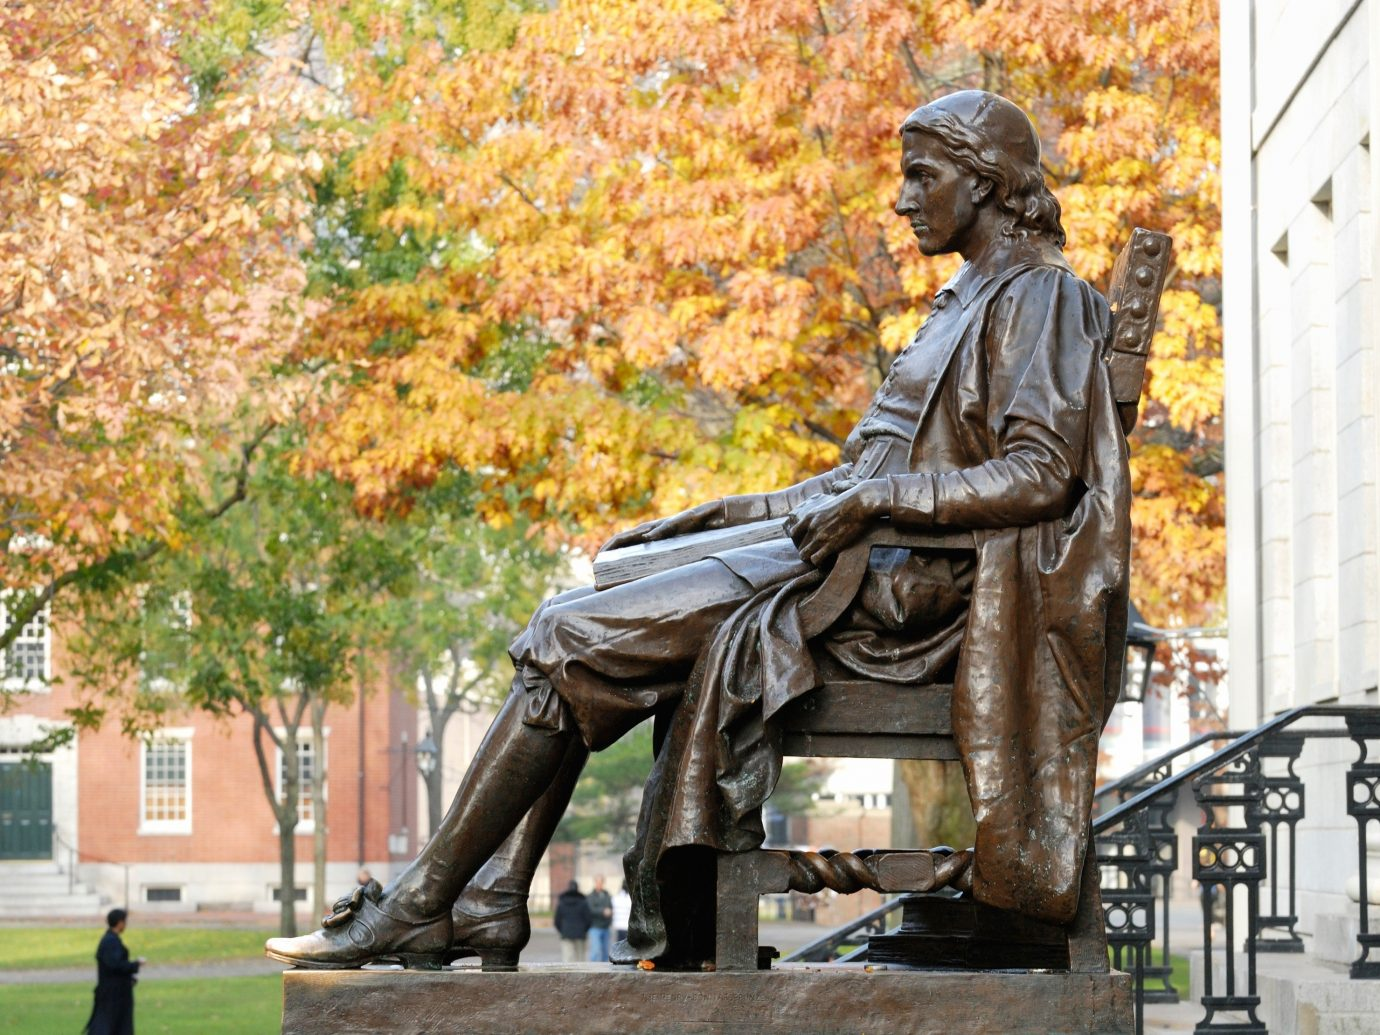 Budget person outdoor statue monument sculpture art memorial